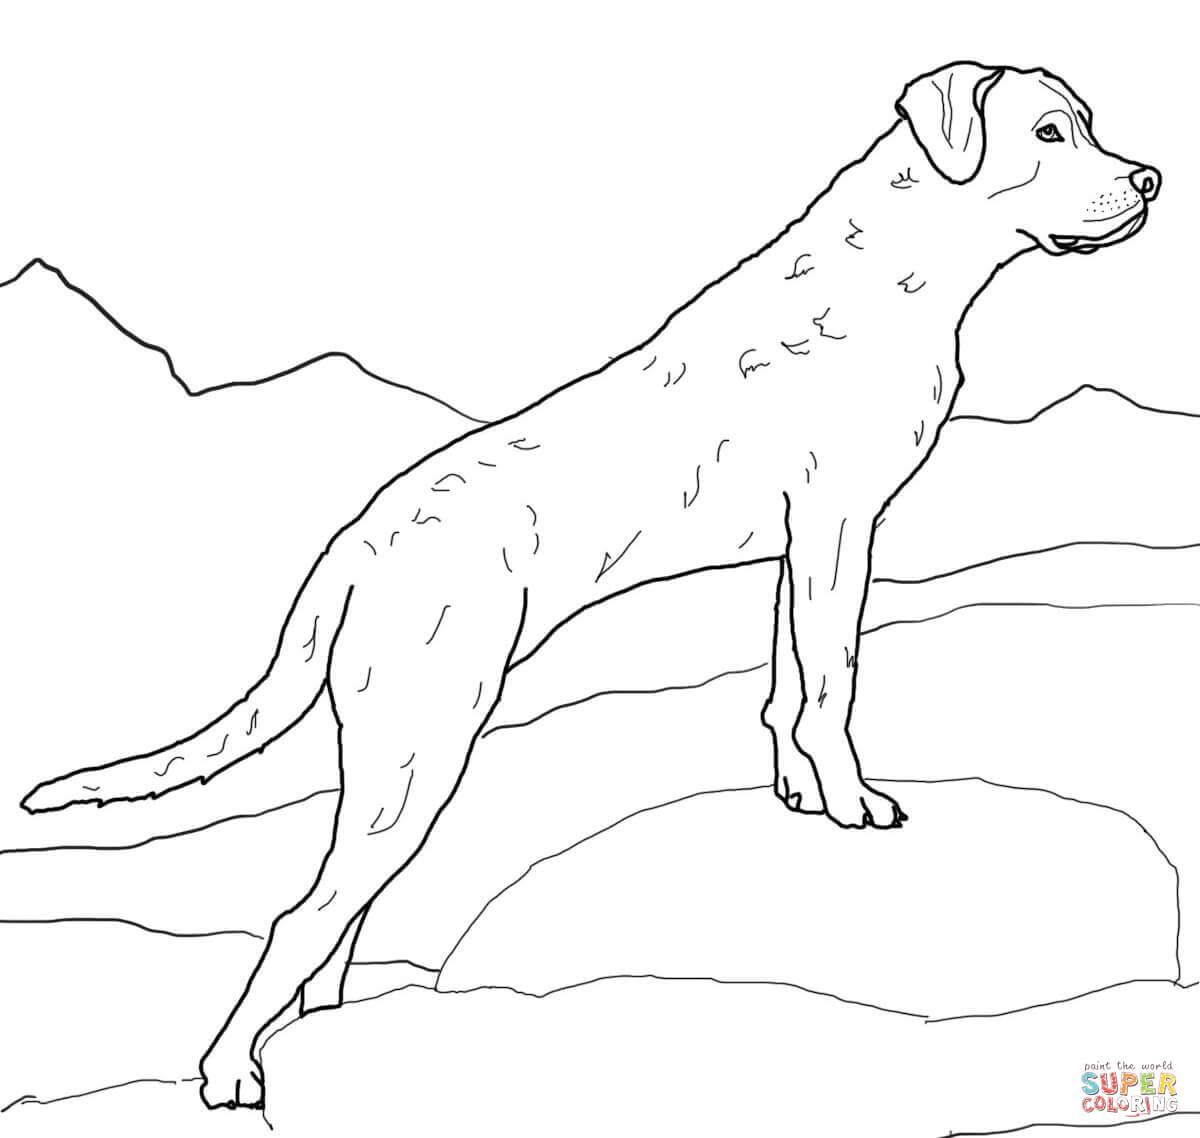 1200x1138 Labrador Retriever Coloring Page Free Printable Coloring Pages